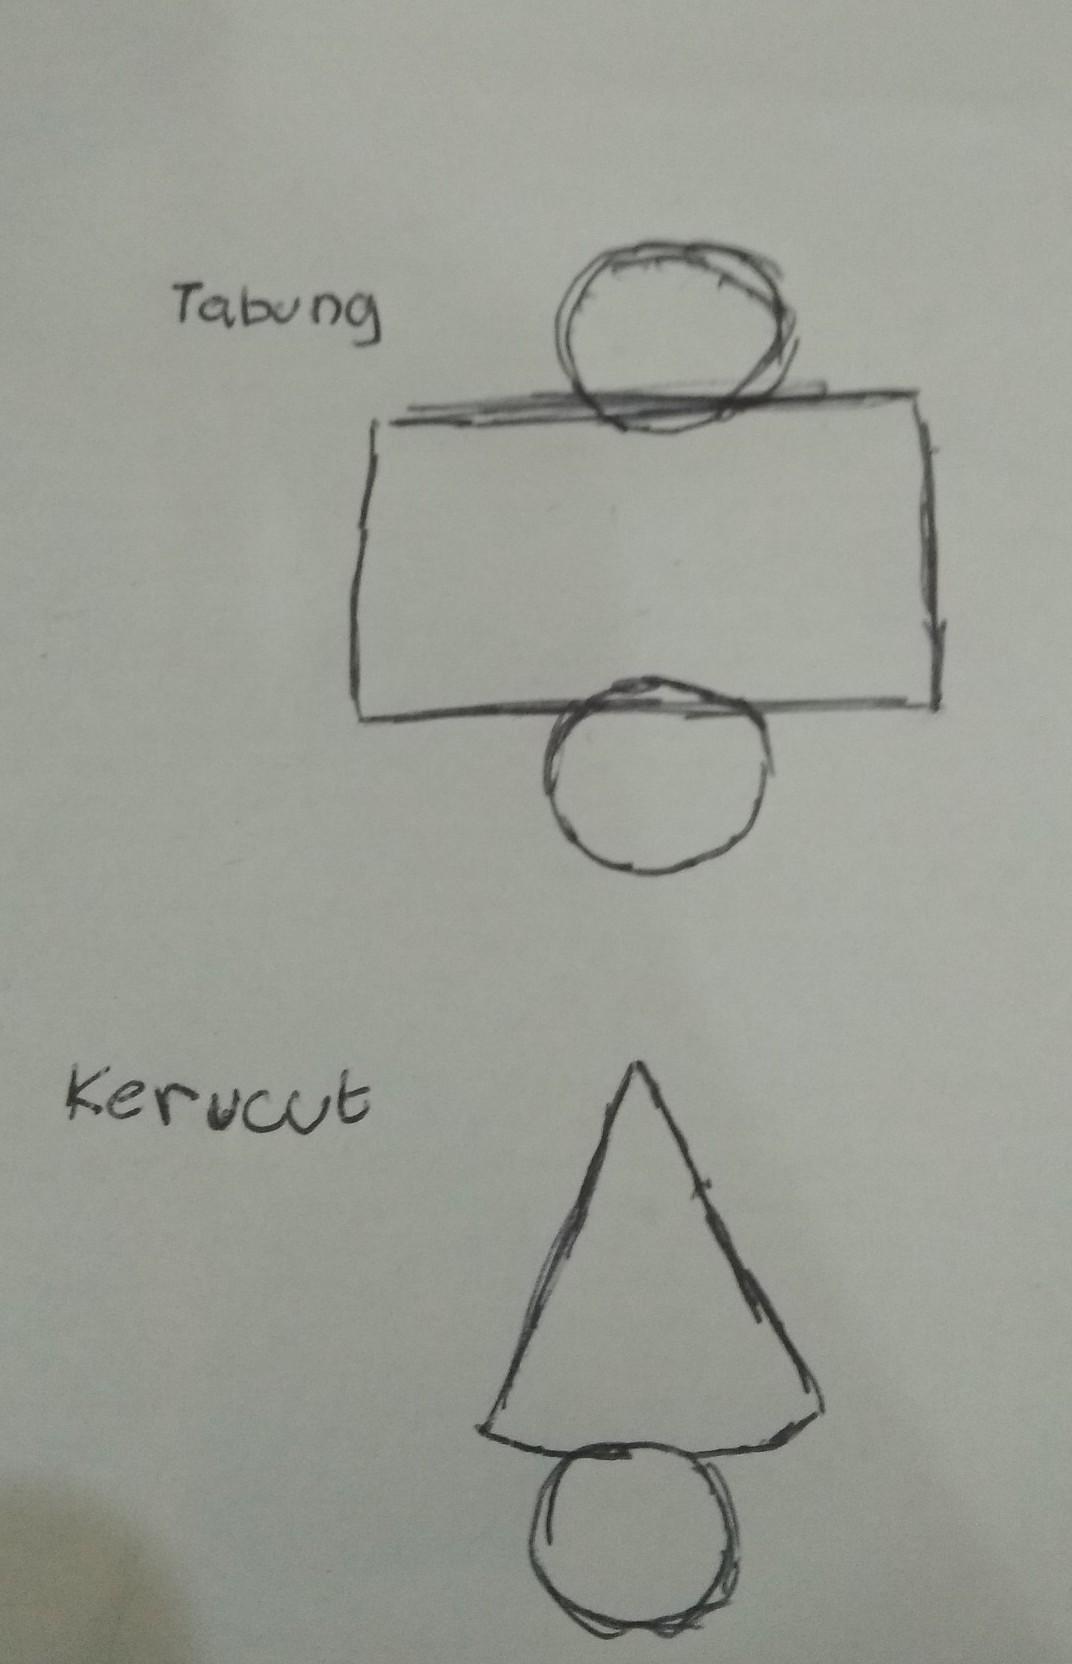 Jaring-jaring Tabung : jaring-jaring, tabung, Gambar, Jaring, Tabung, Kerucut, Brainly.co.id